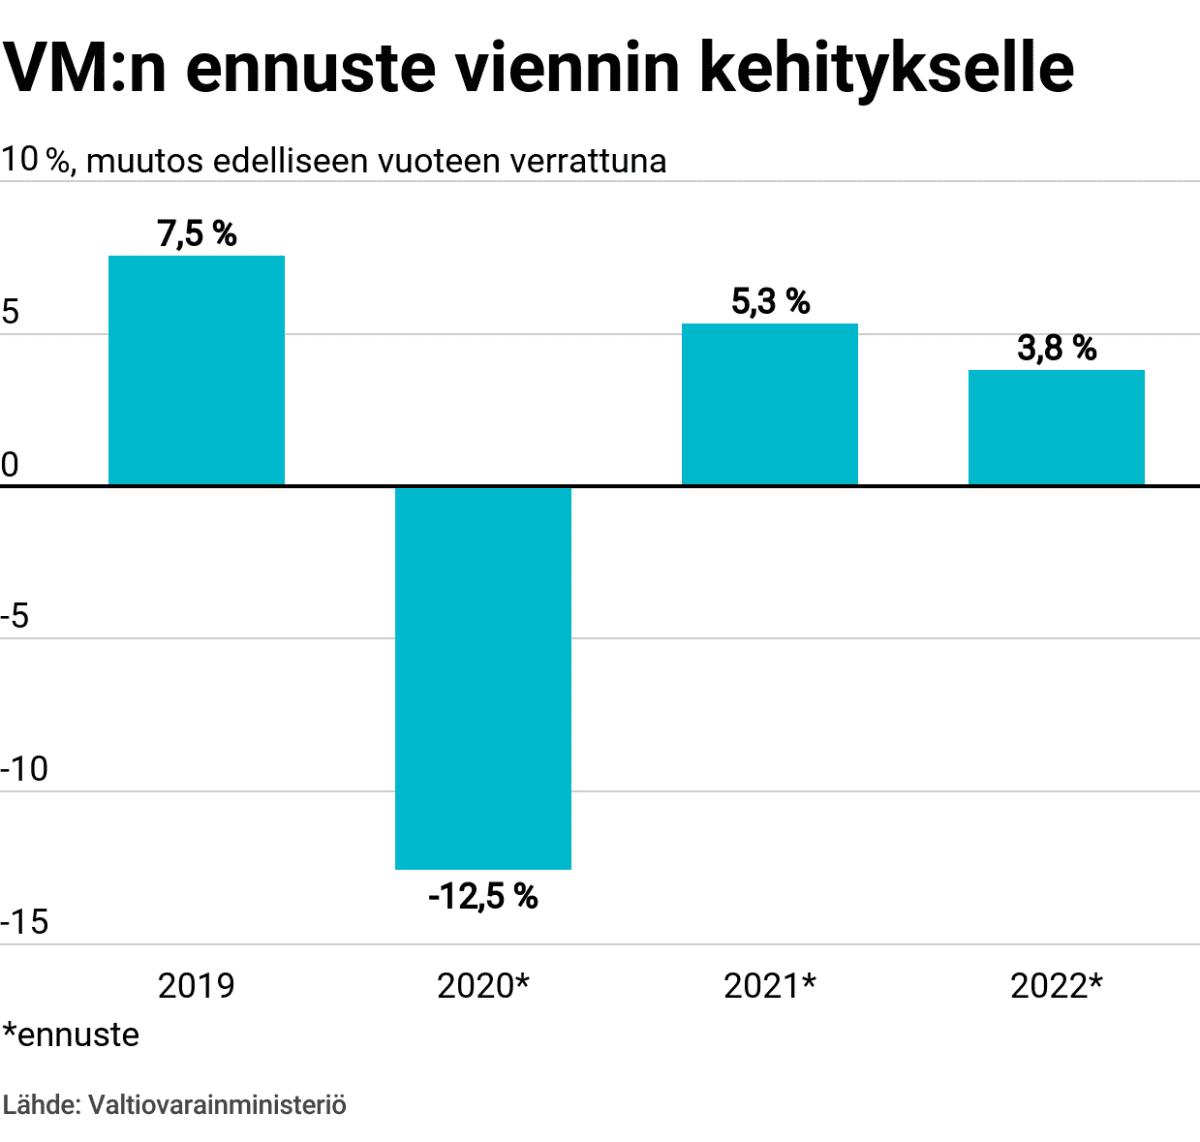 VM:n ennuste viennin kehitykselle